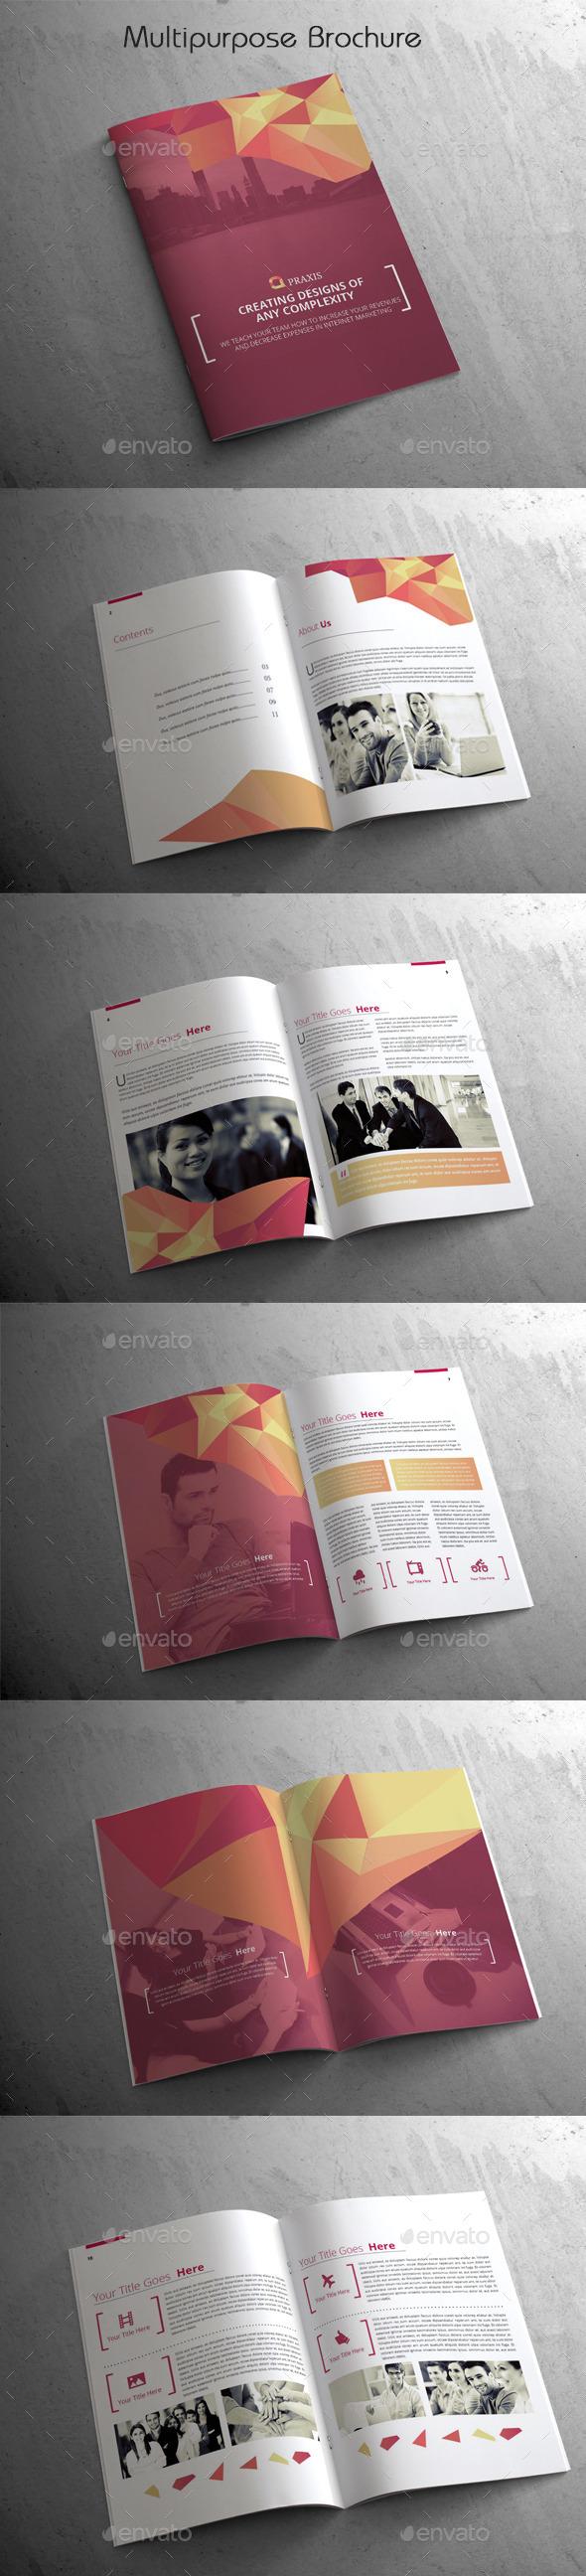 Multipurpose Brochure - Brochures Print Templates